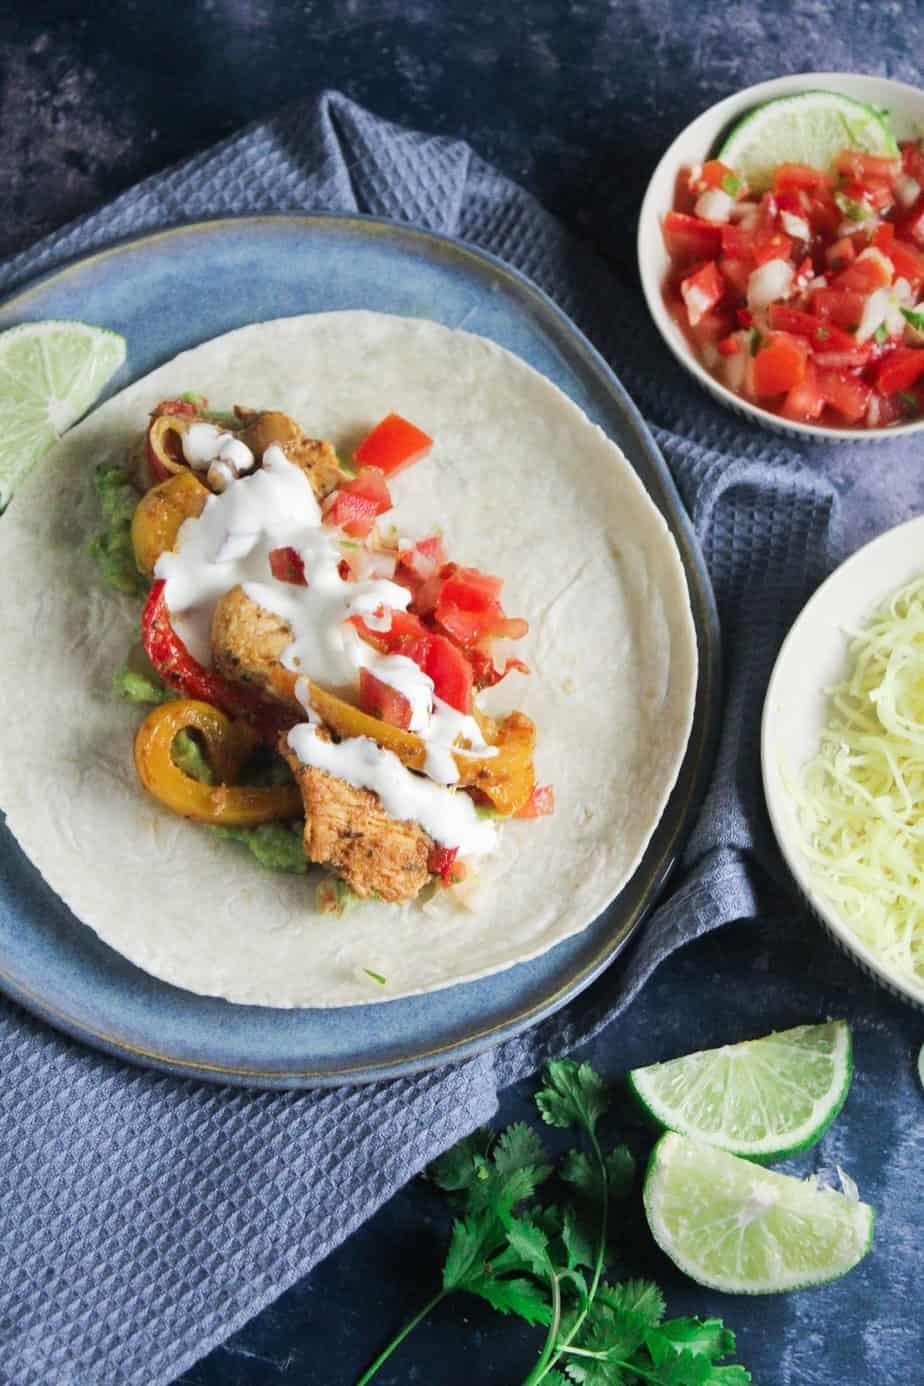 Easy Chicken Fajitas with Homemade Seasoning